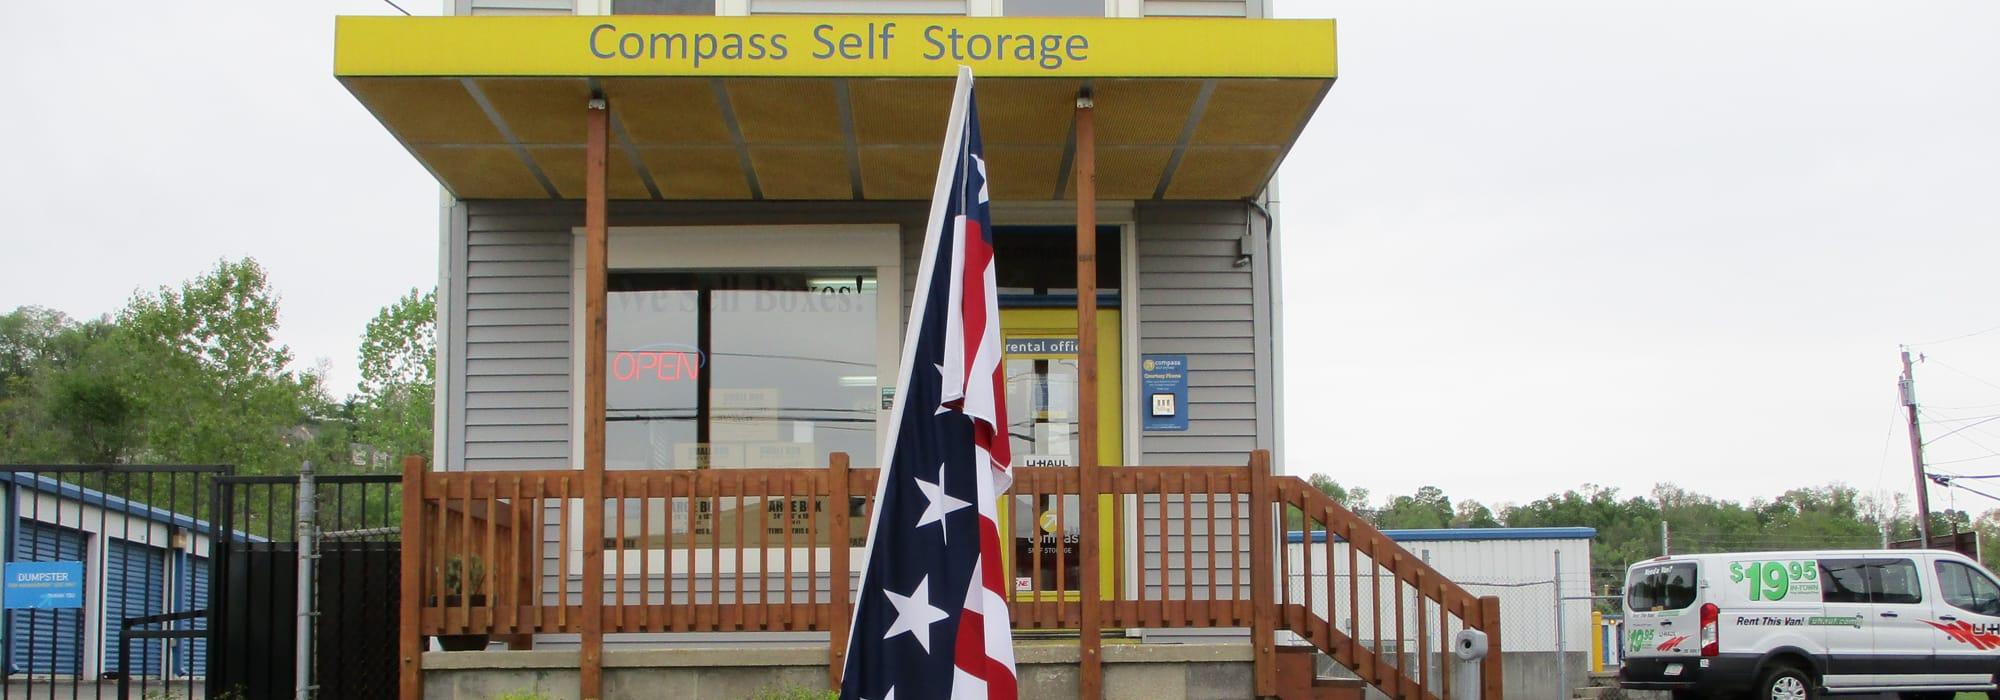 Self storage in Cincinnati OH